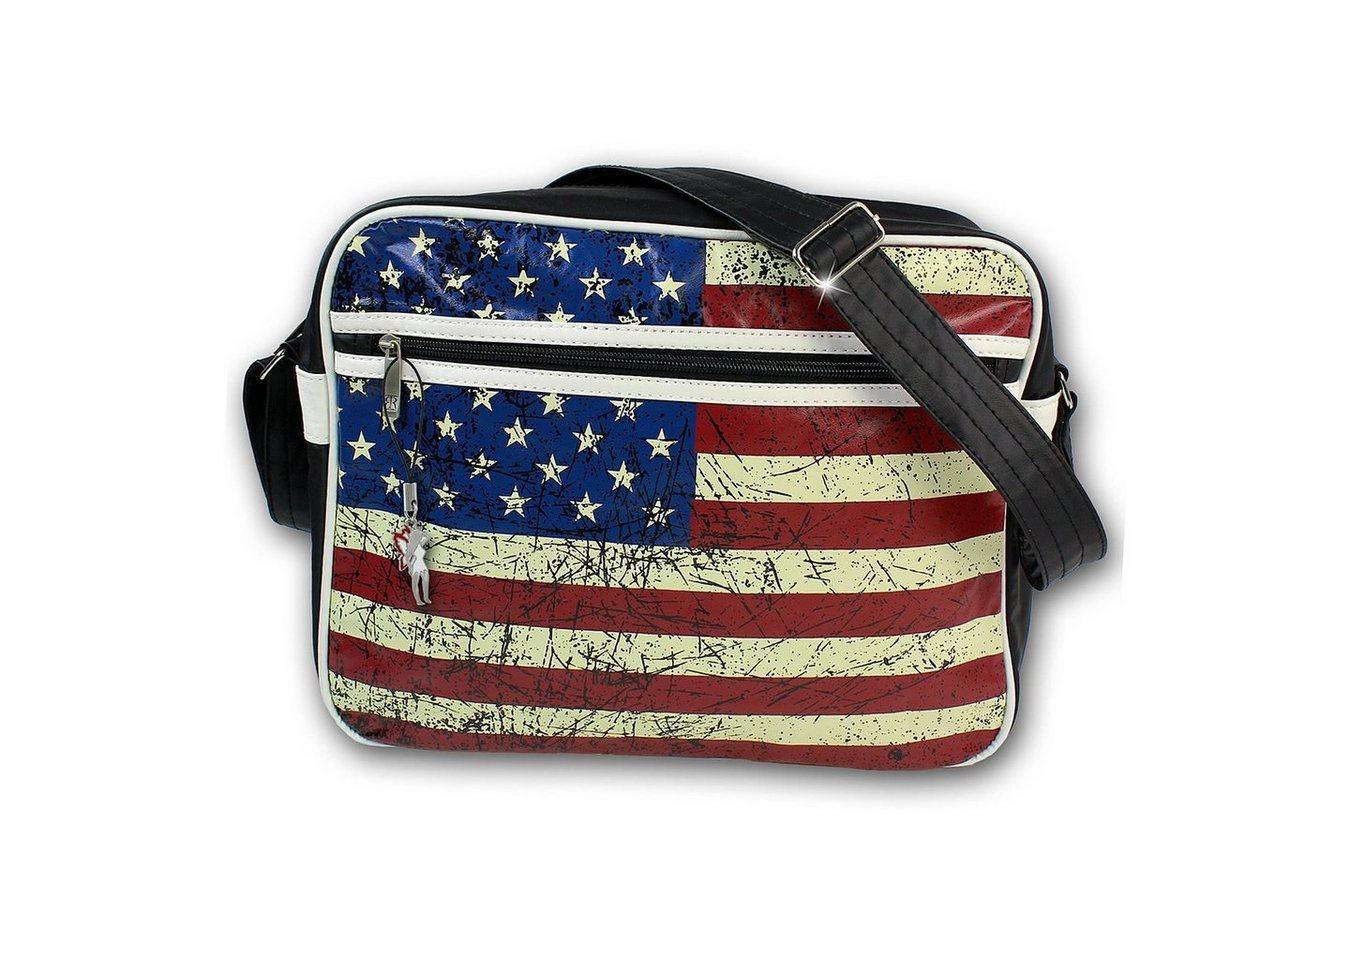 robin ruth -  Umhängetasche »OTG1040F  USA Flagge Umhängetasche« (Umhängetasche), Umhängetasche Kunstleder, schwarz ca. 36cm x ca. 12cm